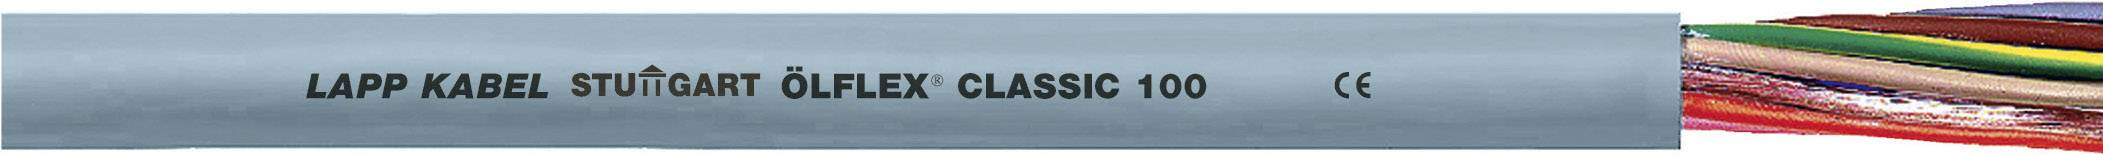 Kabel LappKabel Ölflex CLASSIC 100 6G0,75 (0010025), PVC, 7,3 mm, 500 V, šedá, 100 m